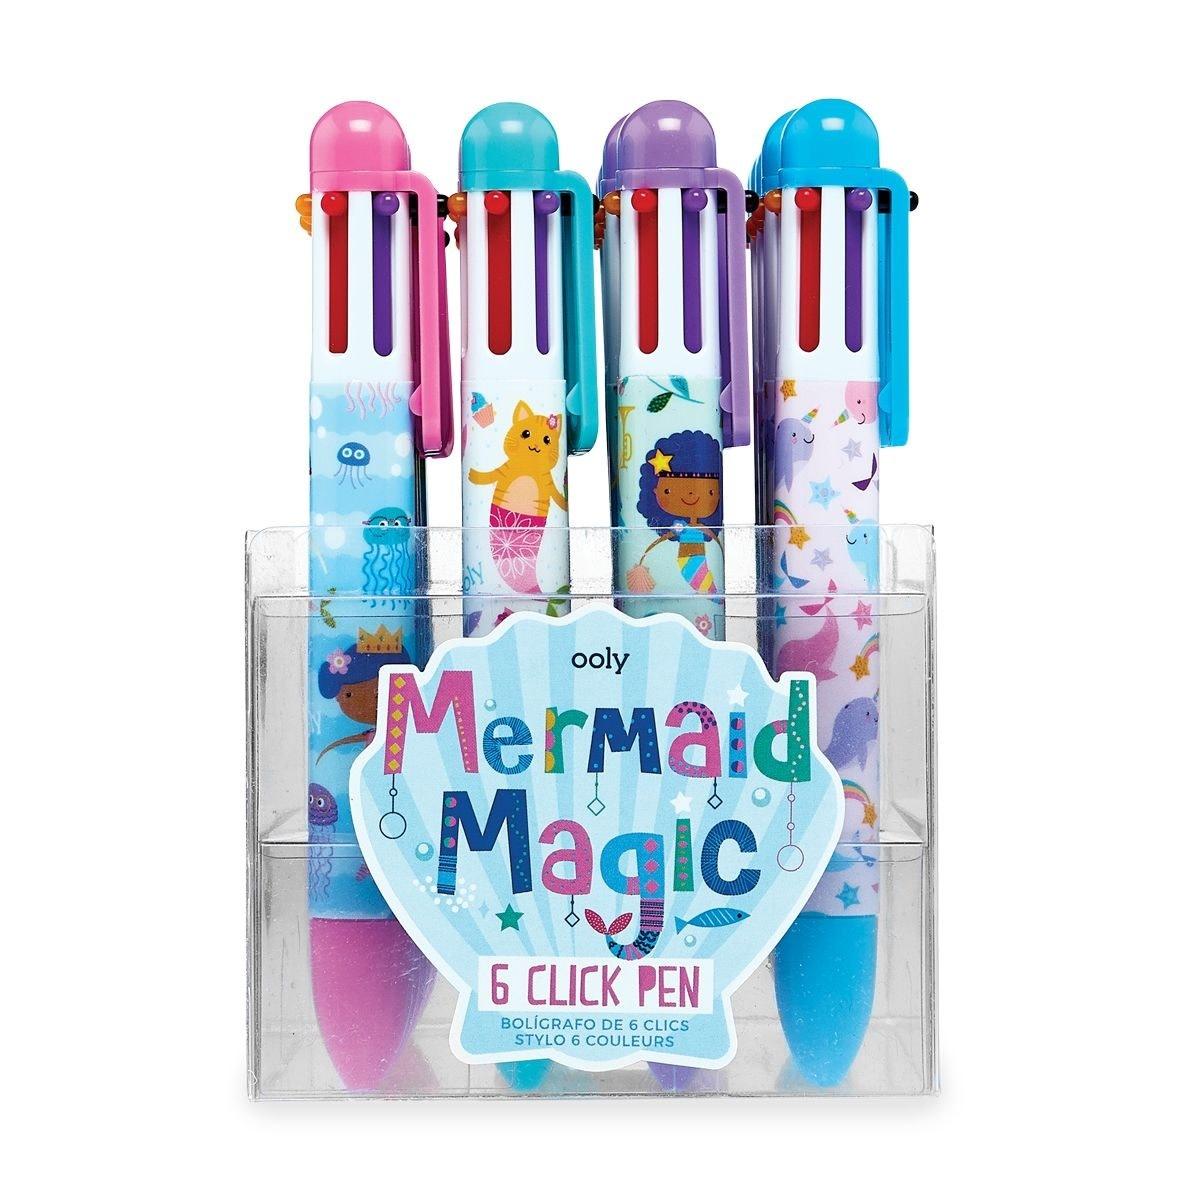 Ooly 6 Click Pens: Mermaid Magic